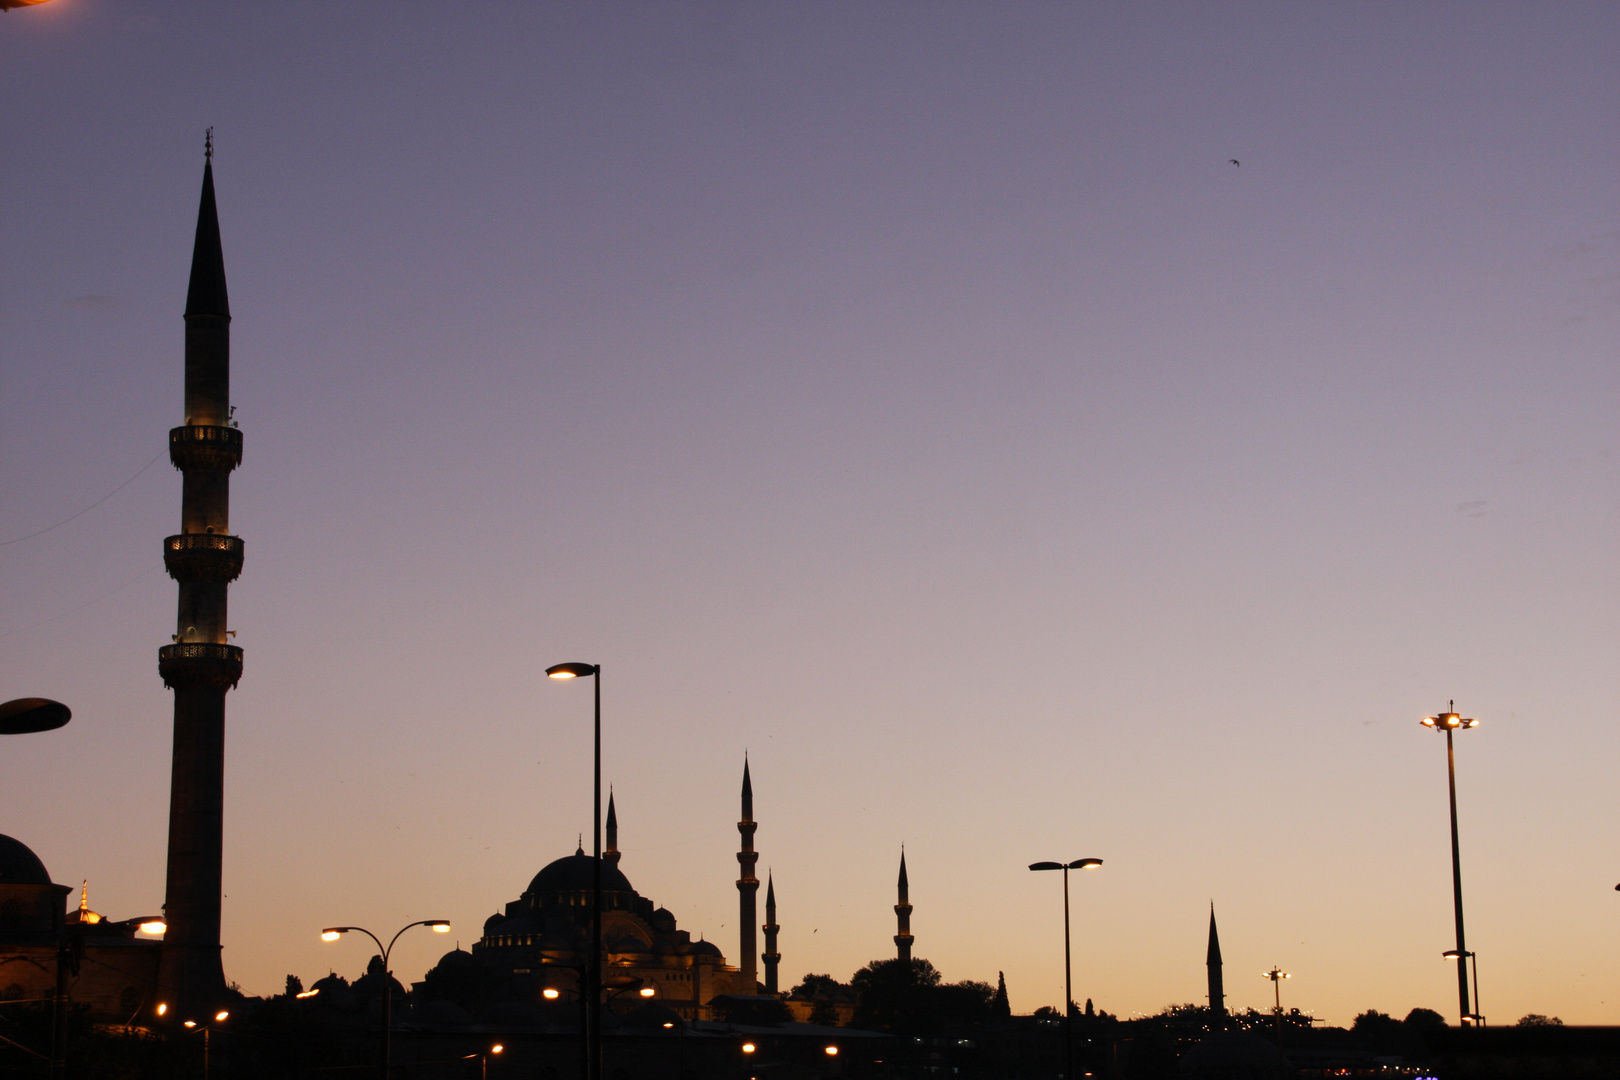 Abend am Bosporus